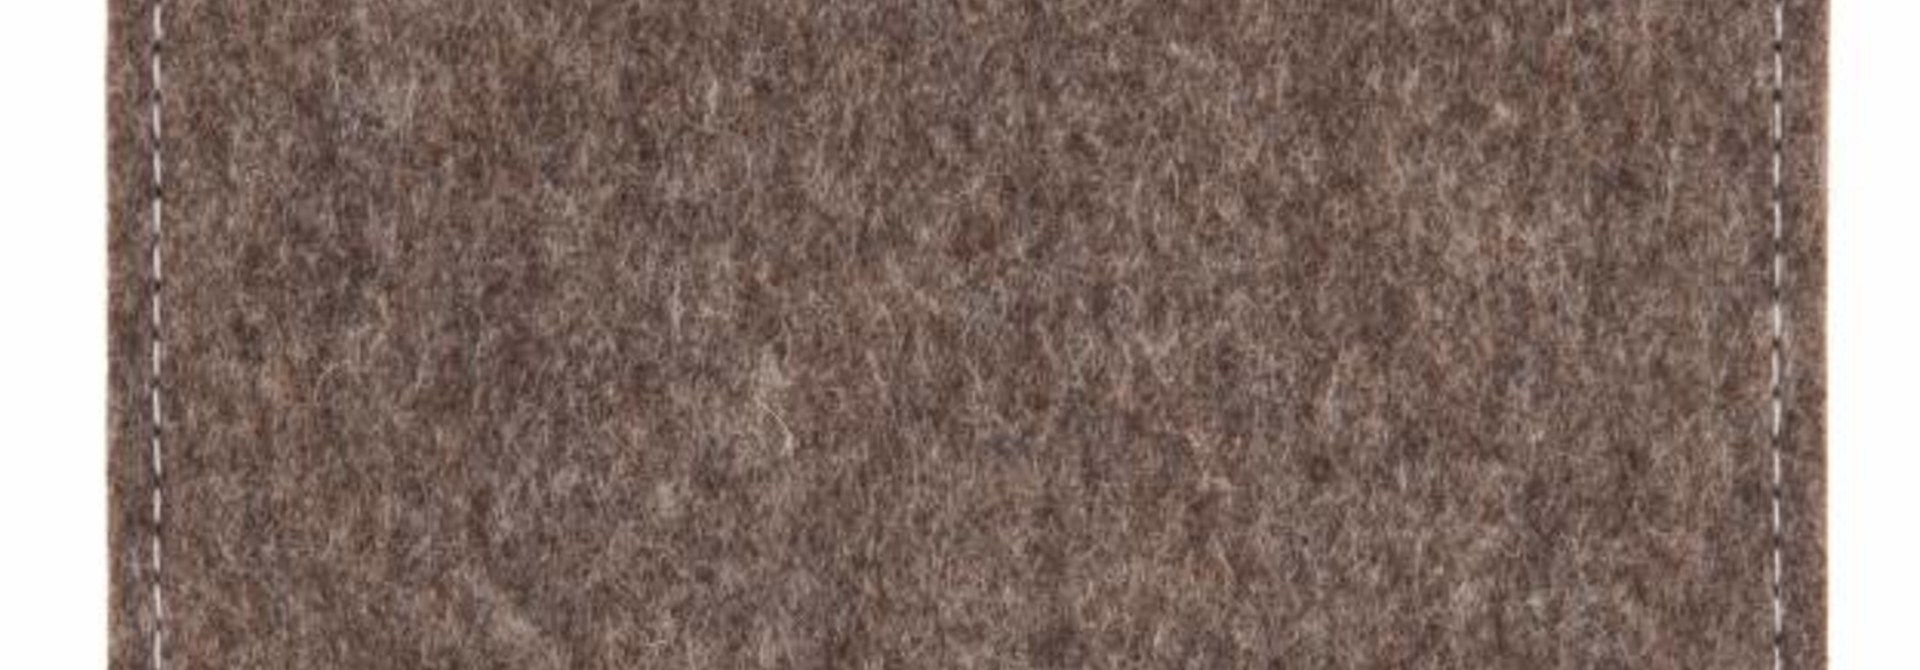 Tablet Sleeve Nature-Flecked